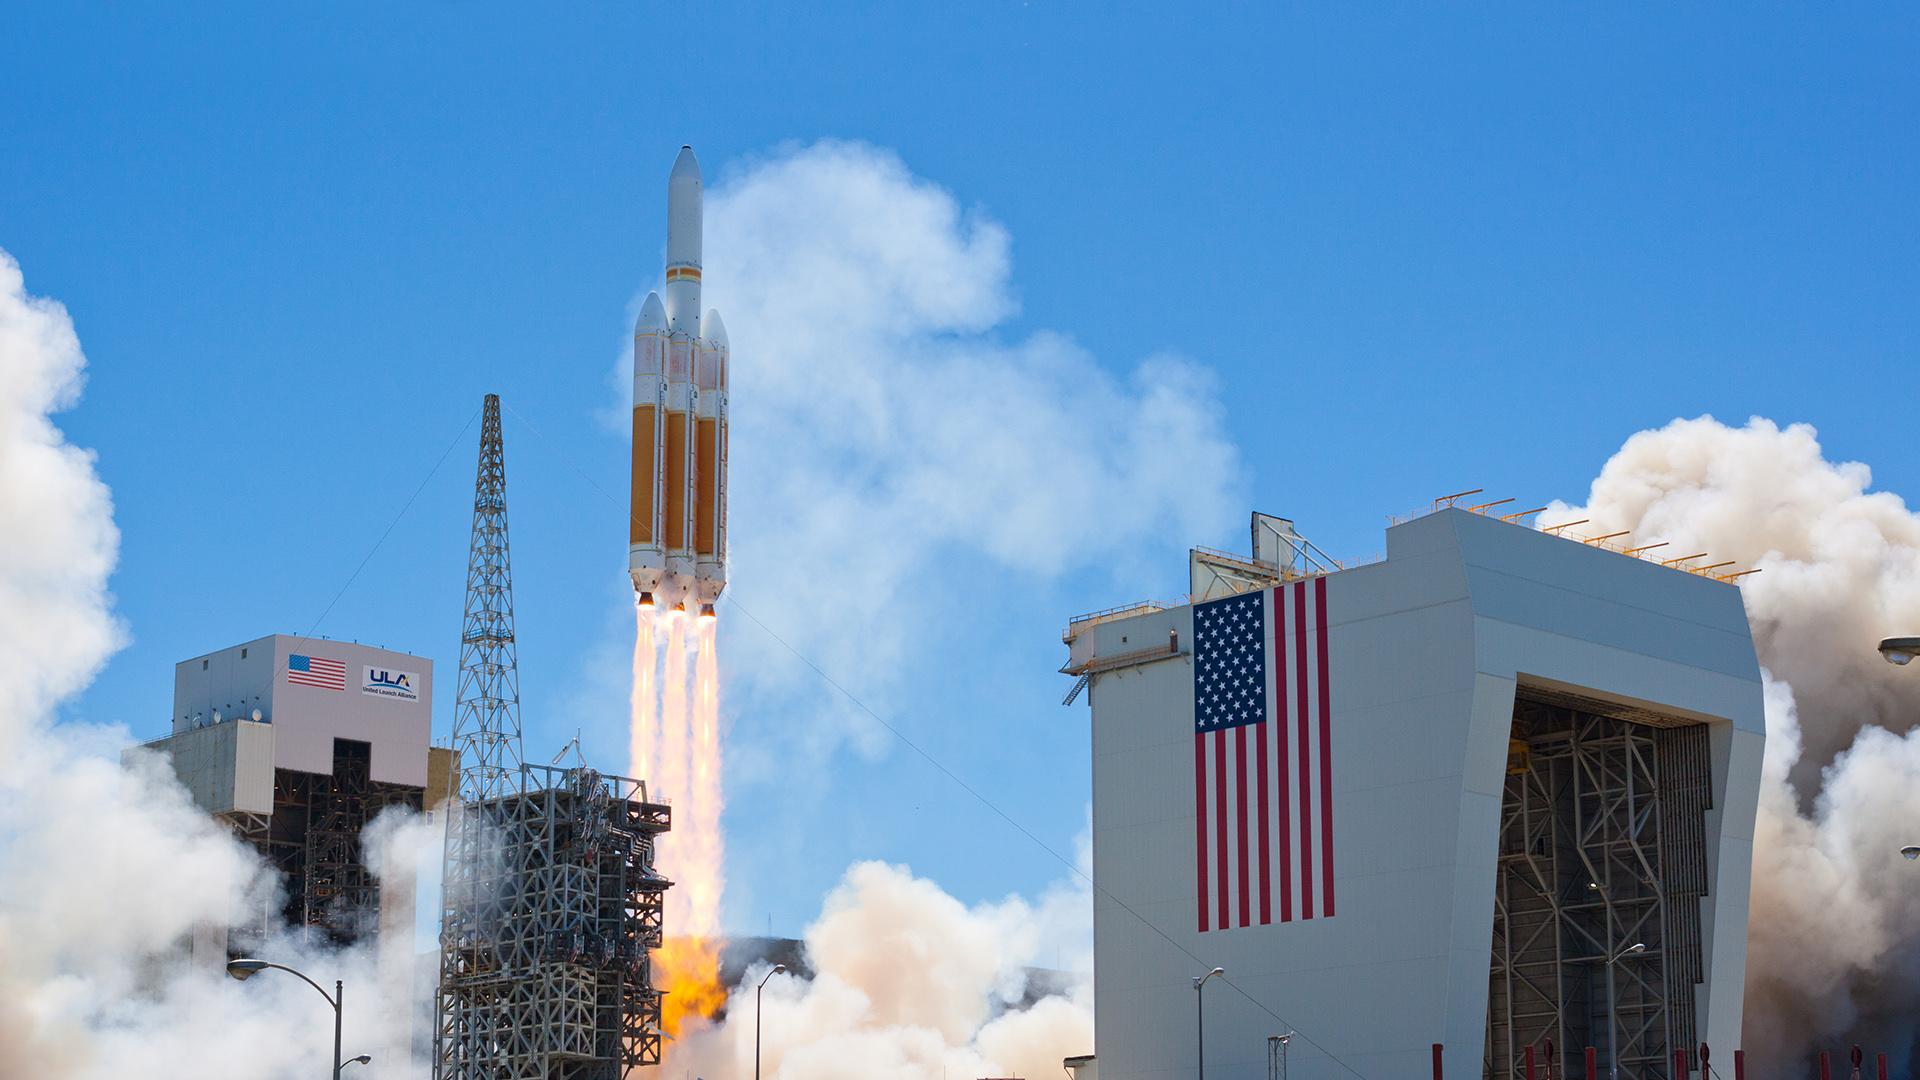 United Launch Services LLC Delta IV Heavy orbital launch vehicle